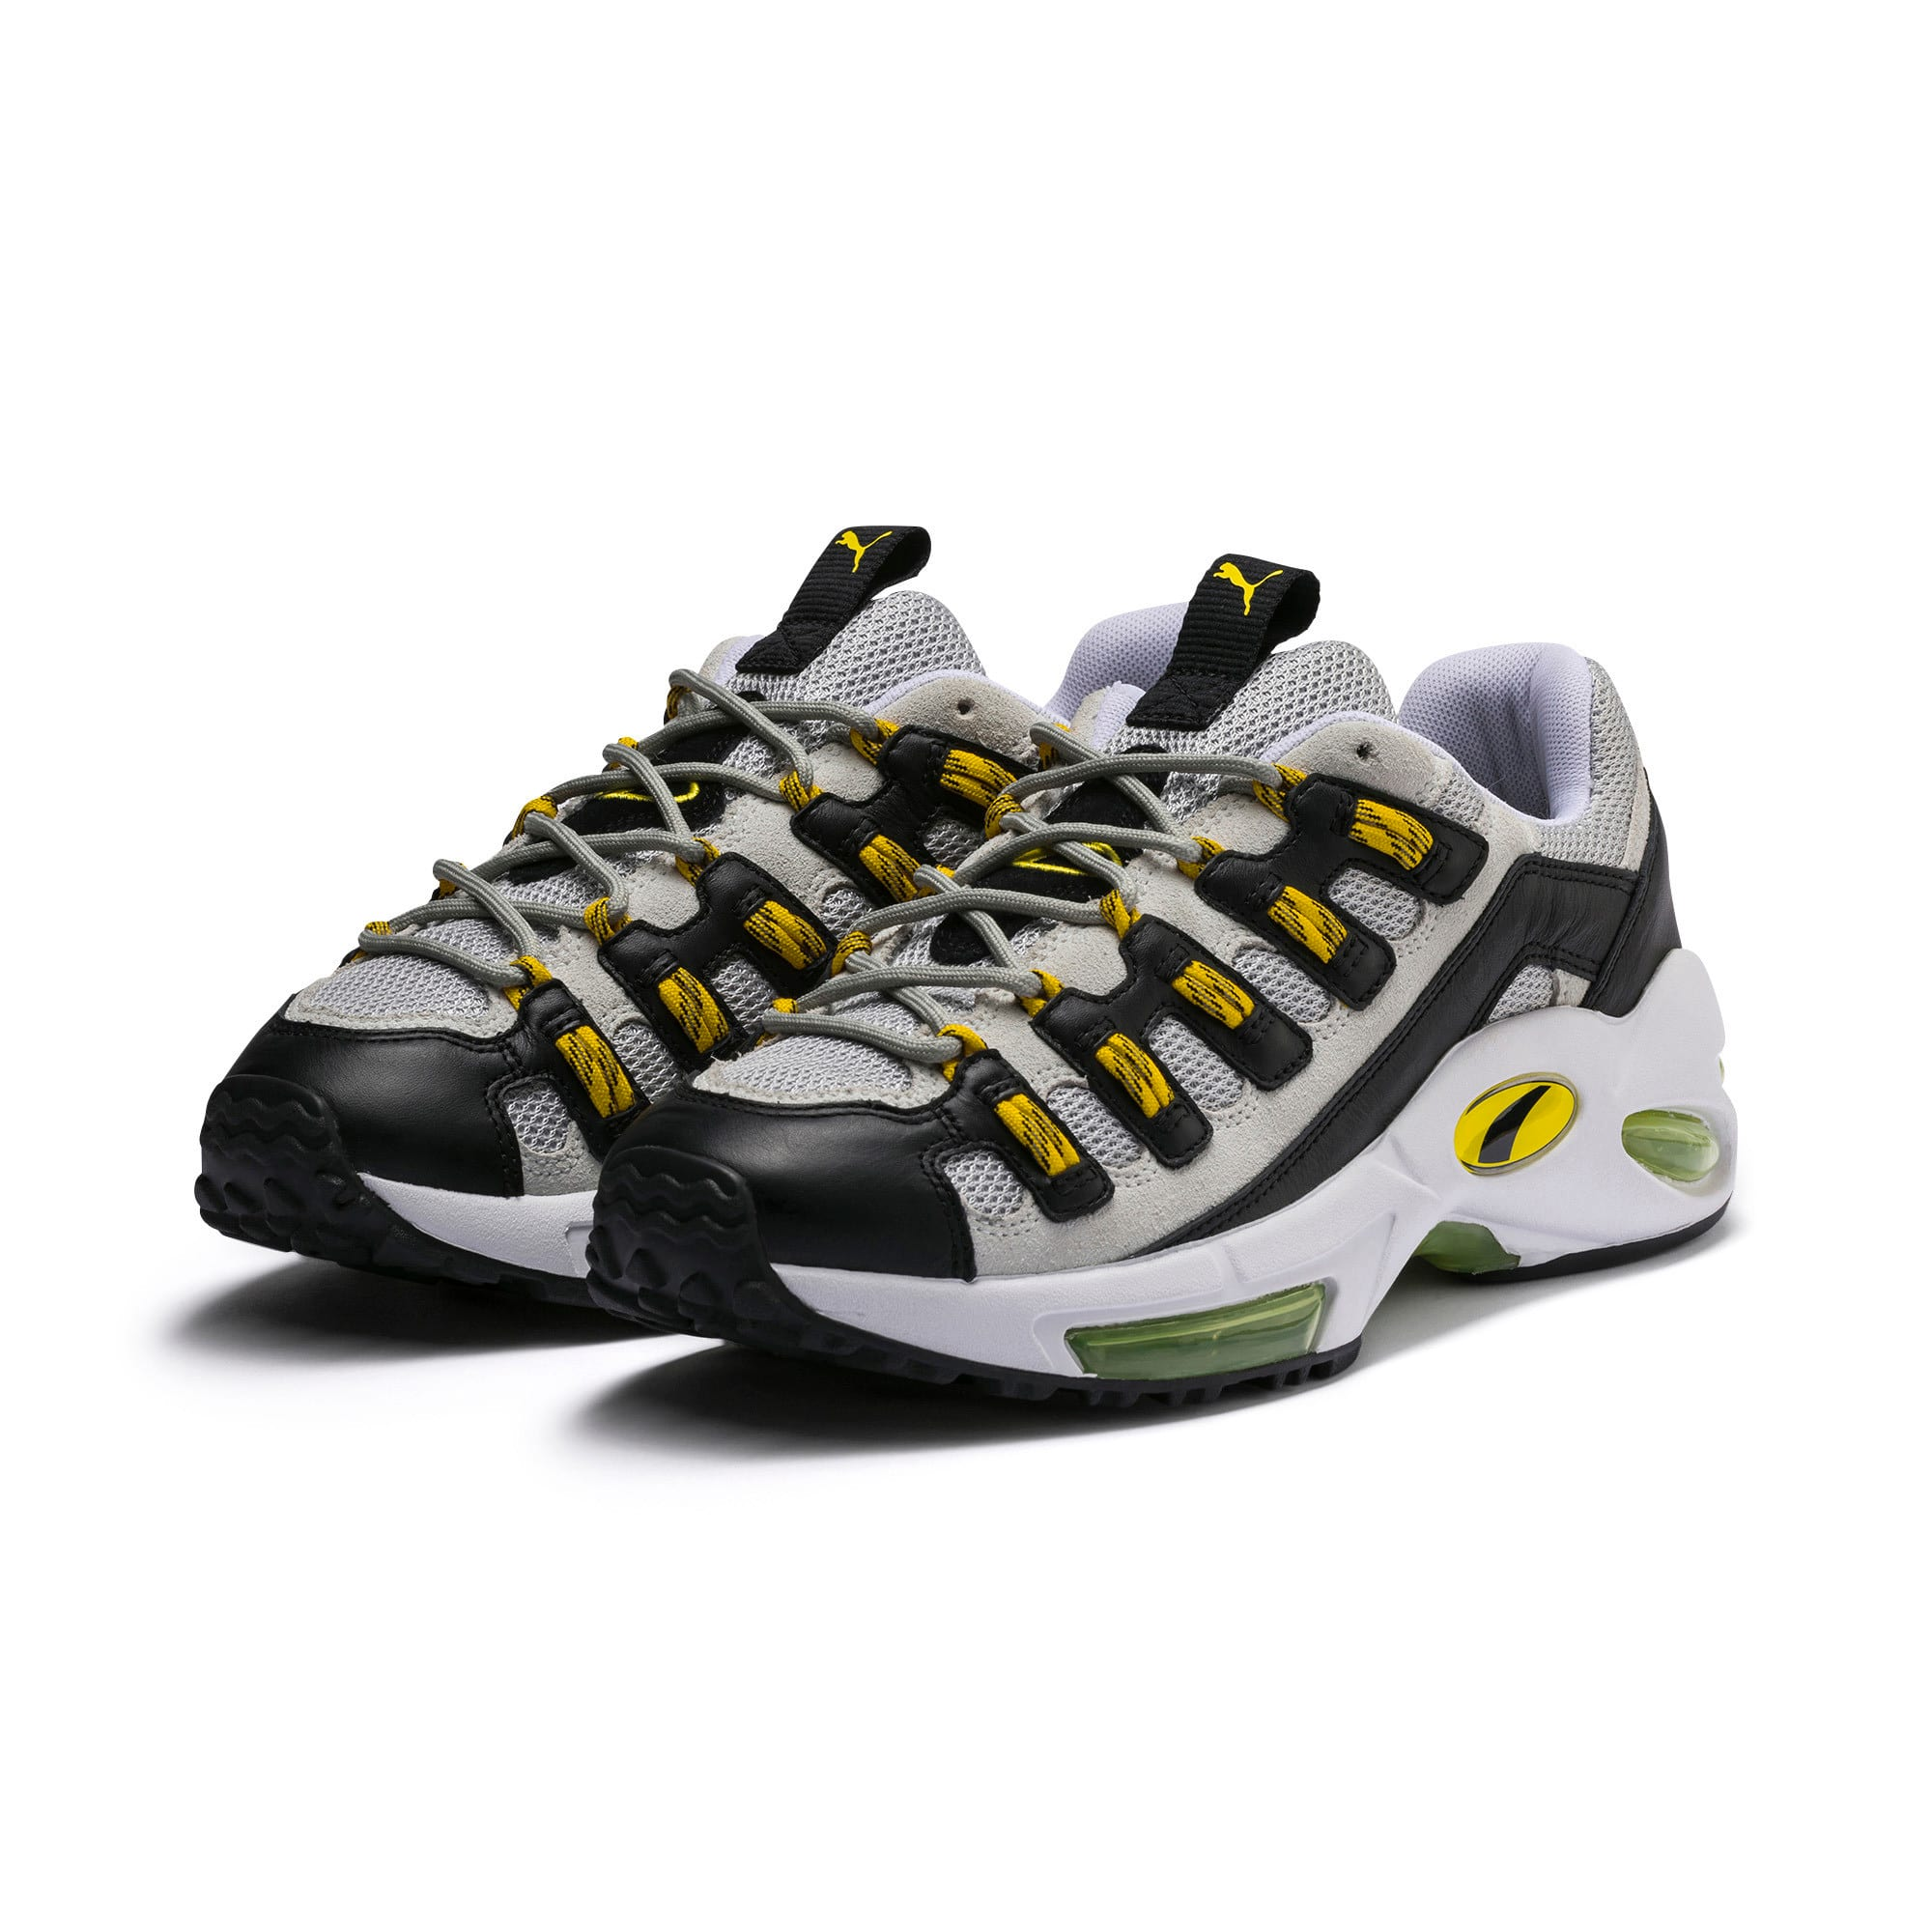 Thumbnail 2 of Cell Endura Trainers, Puma White-Blazing Yellow, medium-IND